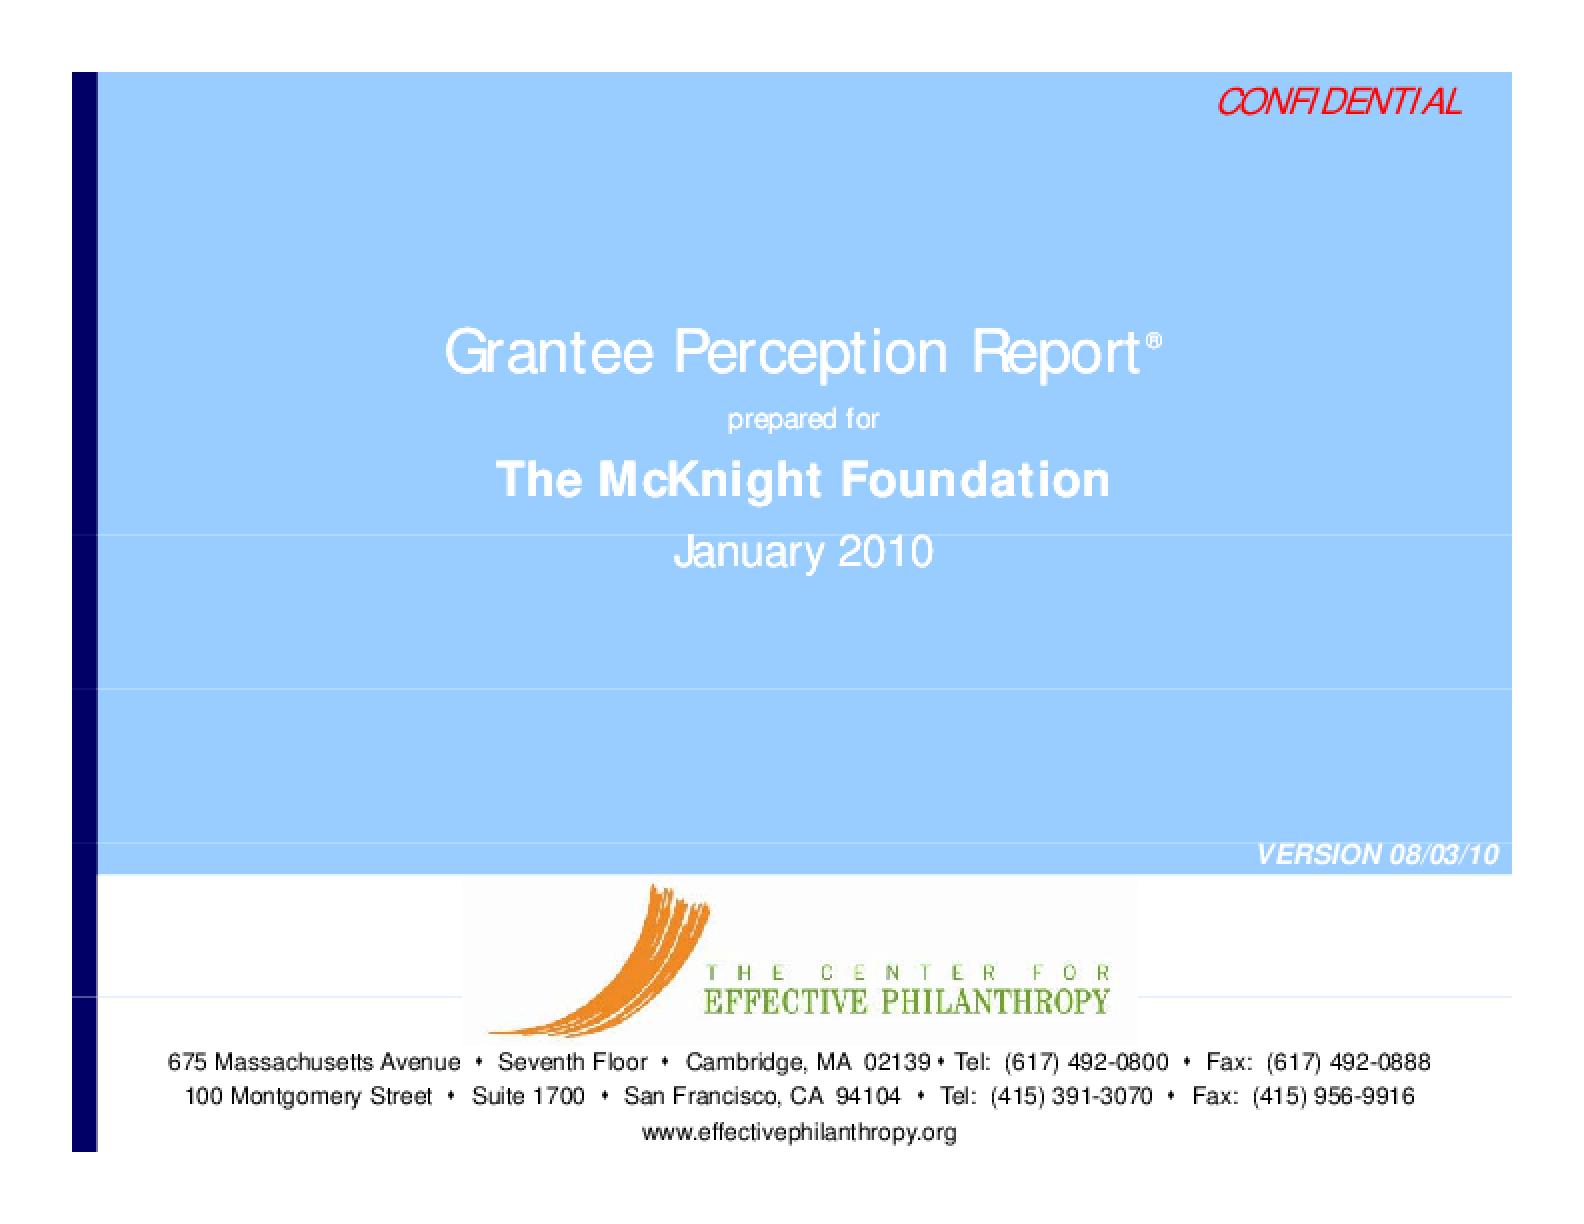 Grantee Perception Report 2009: McKnight Foundation